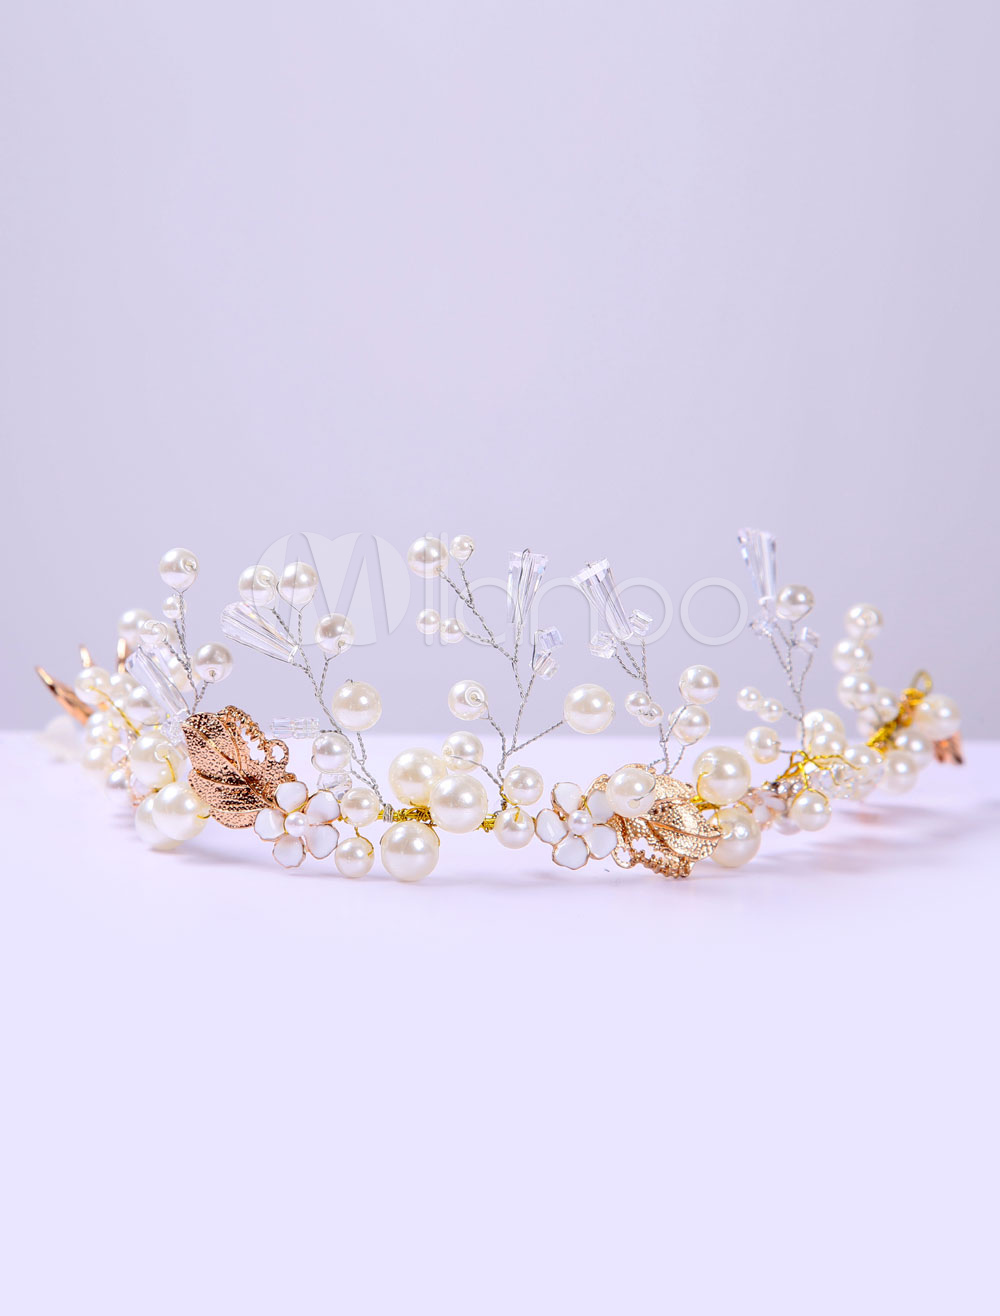 Buy Vintage Wedding Headband Gold Pearls Rhinestone Bridal Headpiece for $14.99 in Milanoo store